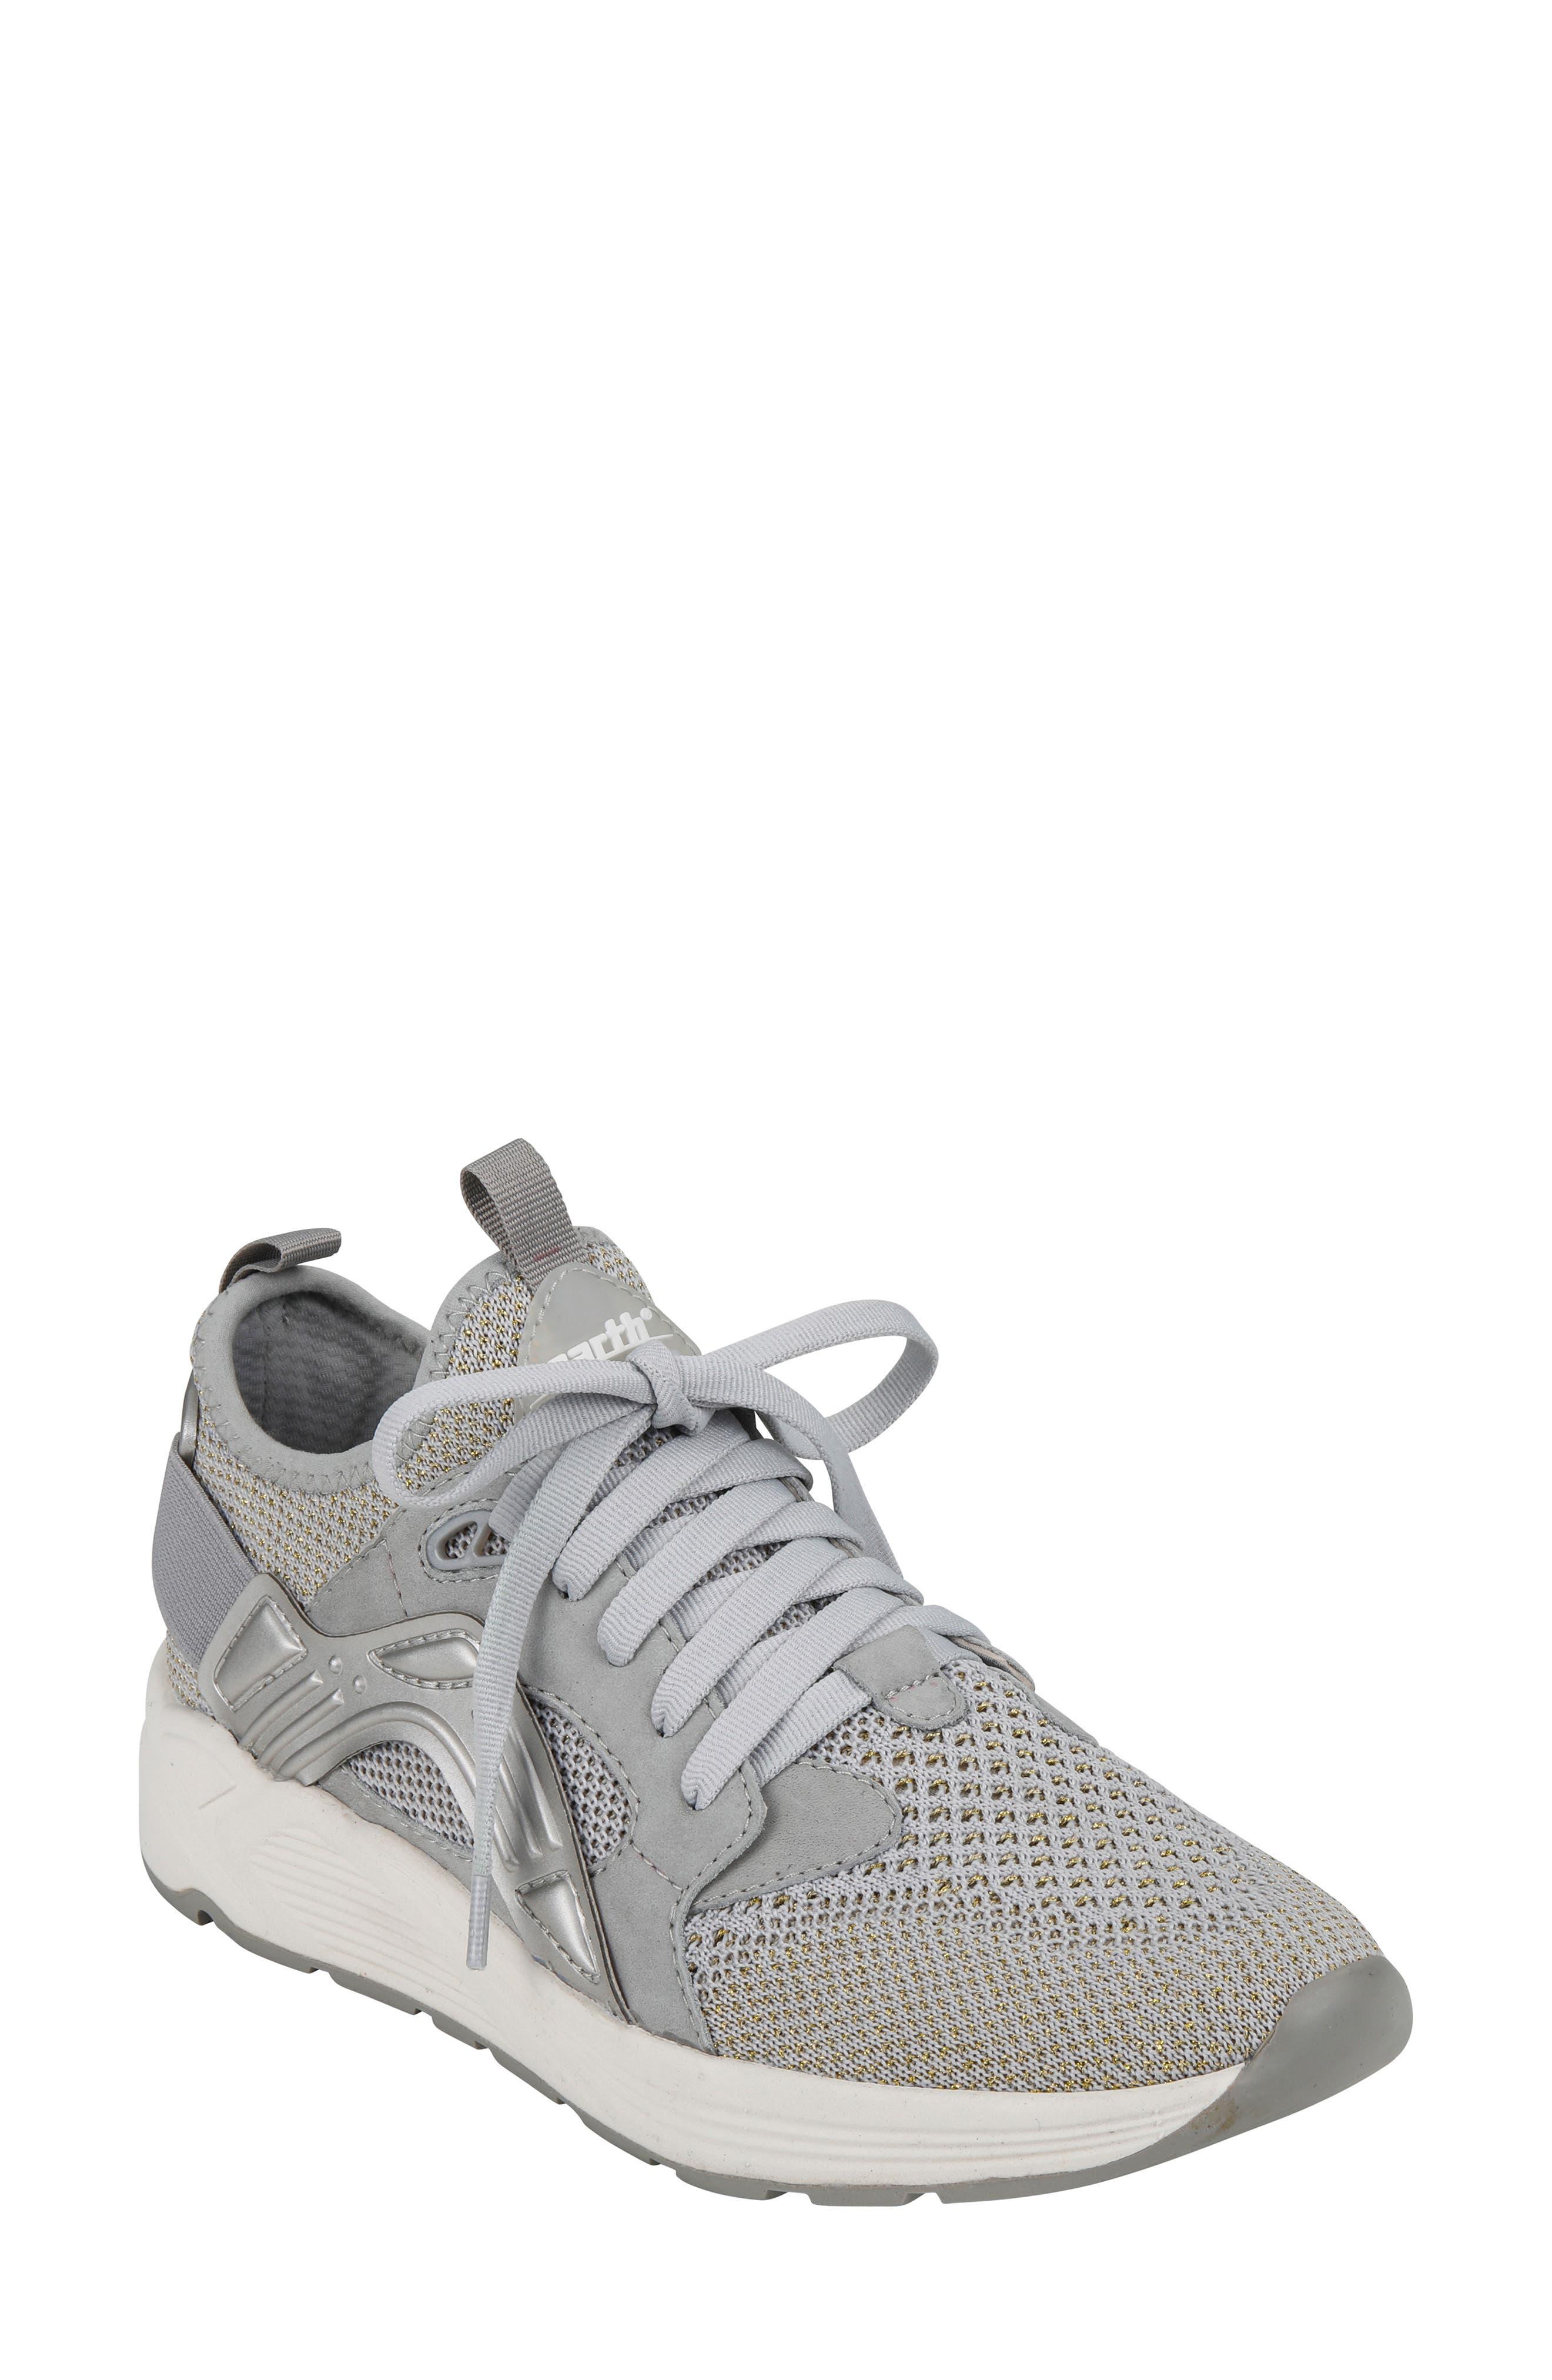 Earth Gallivant Sneaker, Metallic